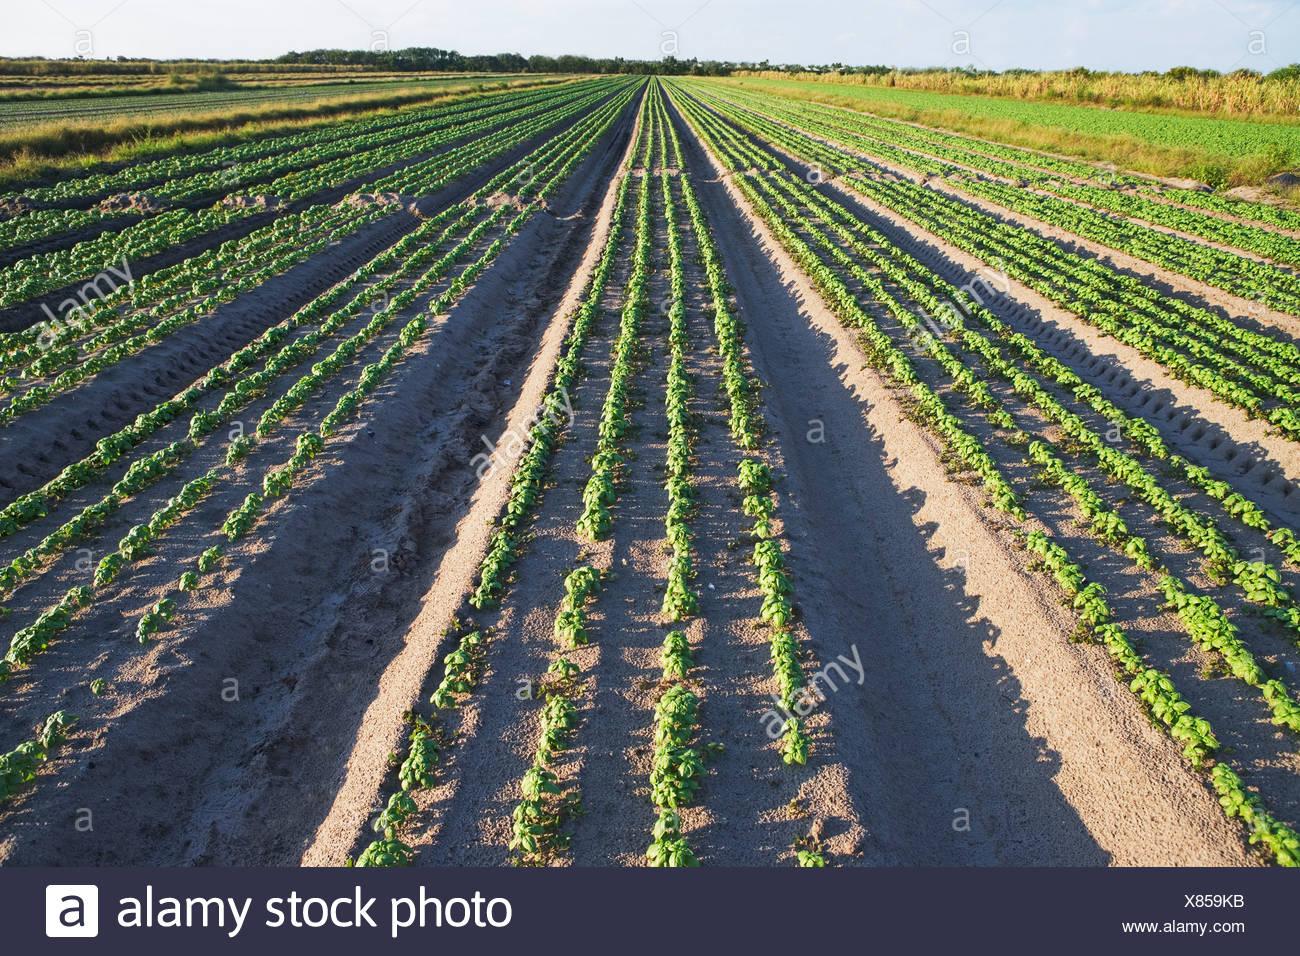 Rows of basil, Florida, United States - Stock Image